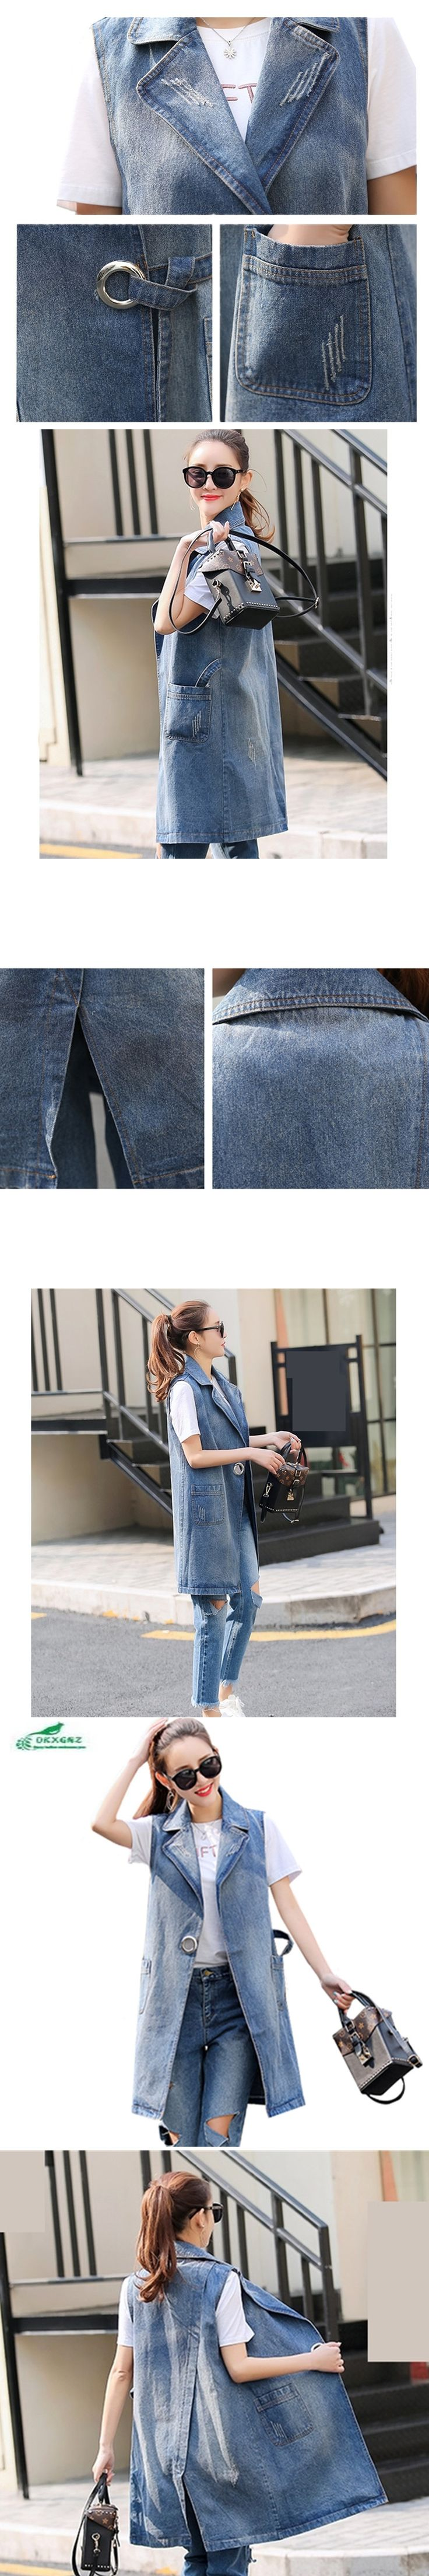 Fashion Women Denim Vests Outwear 2017 Summer Women Plus Size s-3xL Medium-Long Casual Coat Sleeveless Denim Jacket A275 OKXGNZ